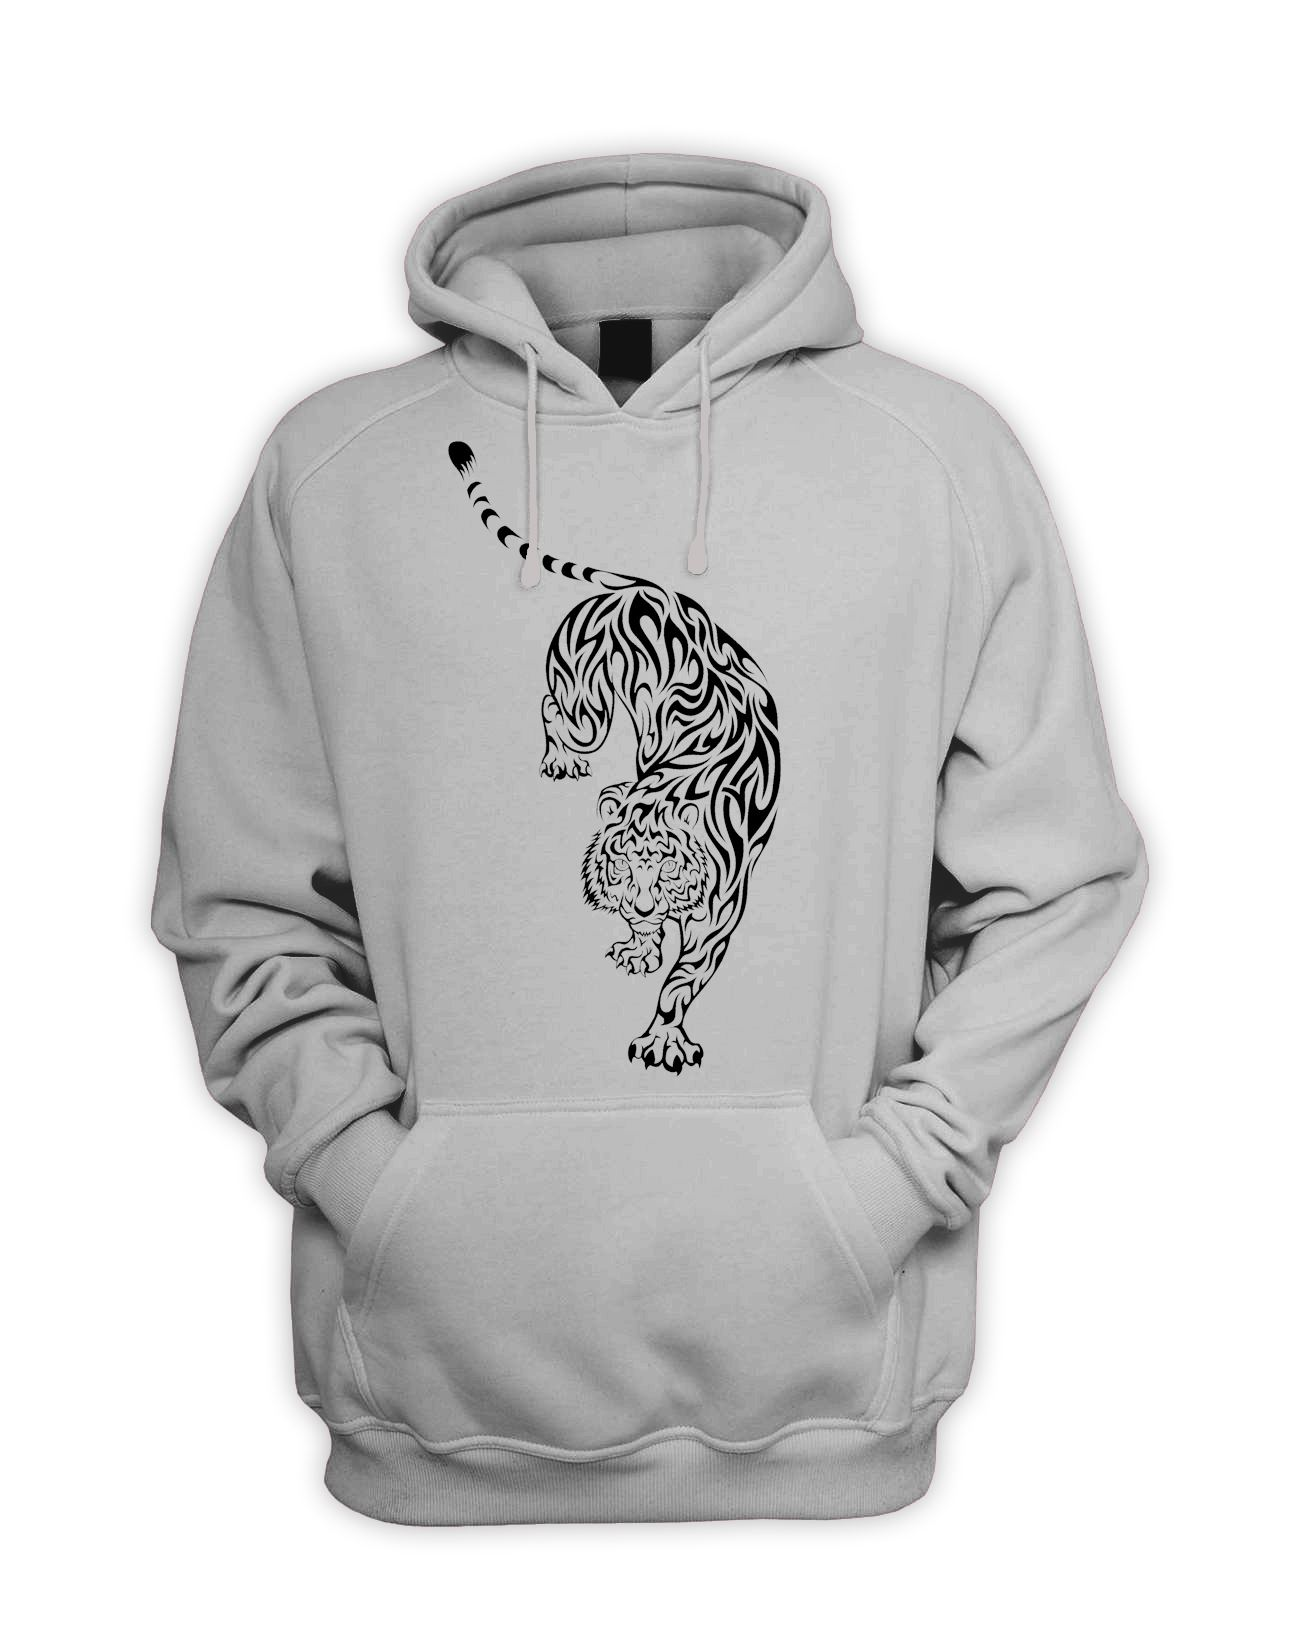 Tiger Tribal Tattoos For Men